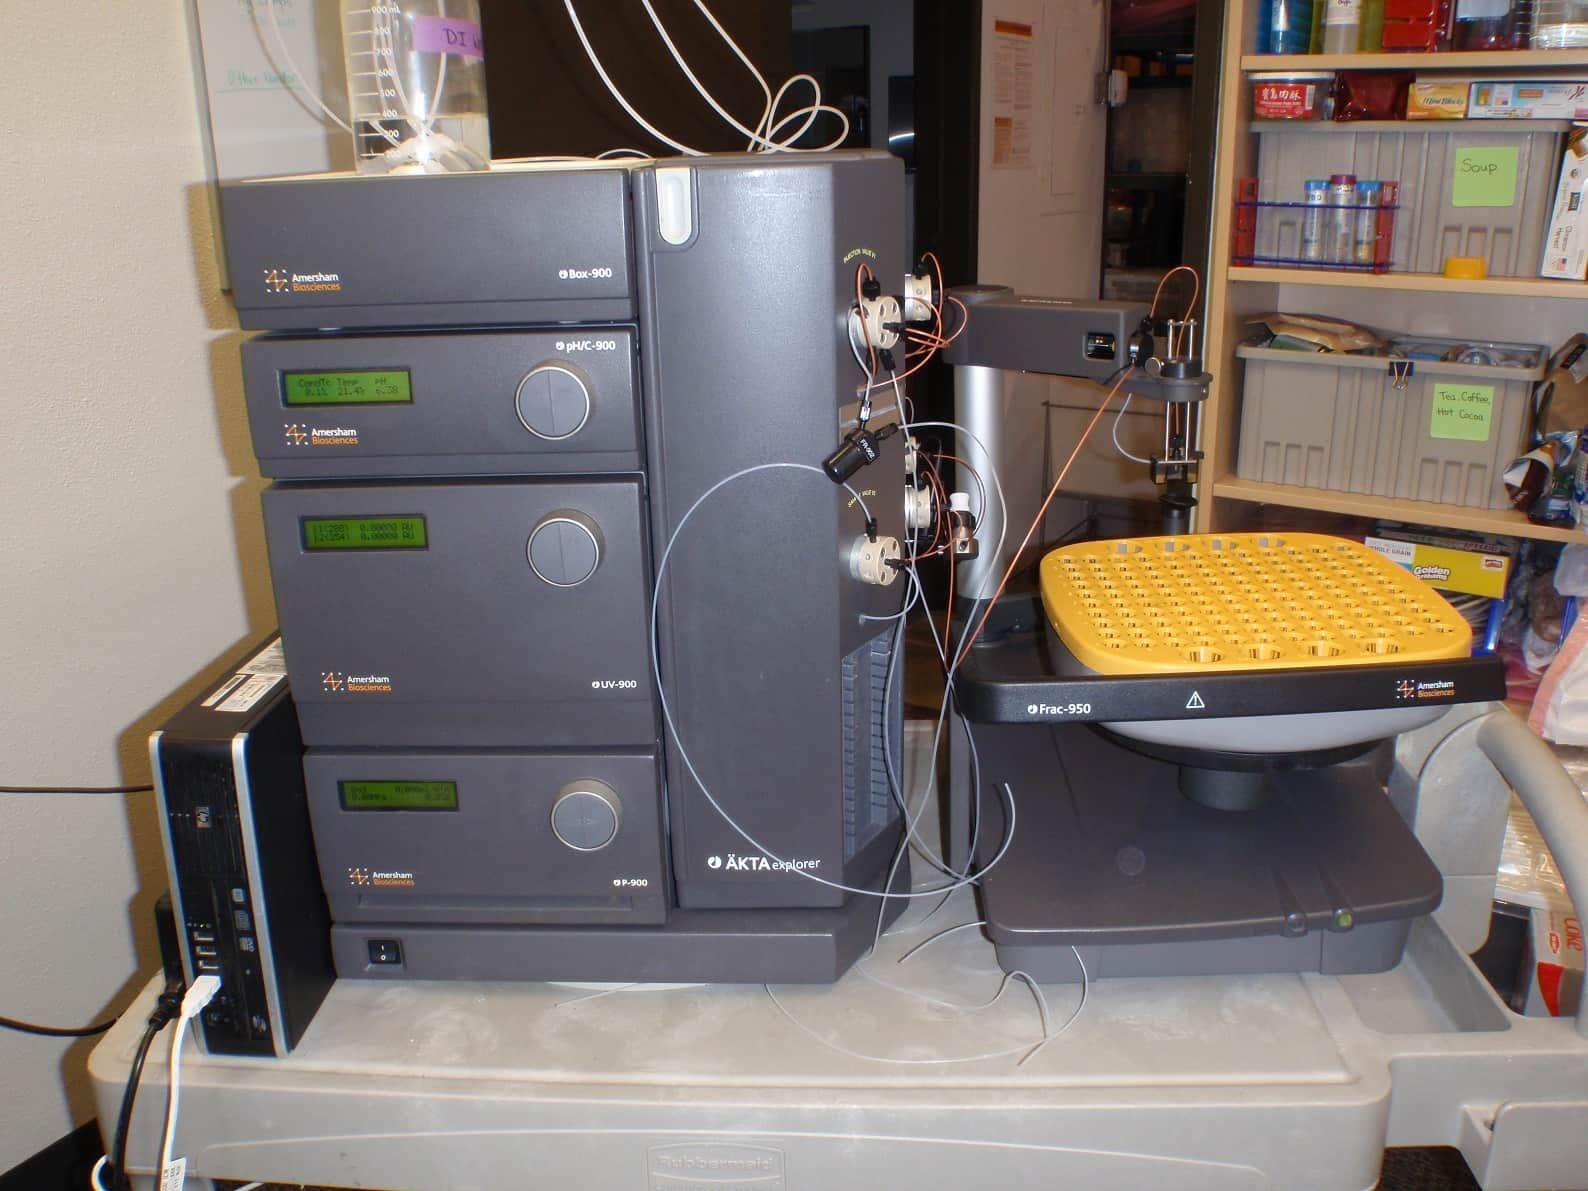 ** Summer Sale!!**  Fully Refurbished Amersham Bioscience AKTA Explorer 100 FPLC w/ Frac-950 + Desktop PC